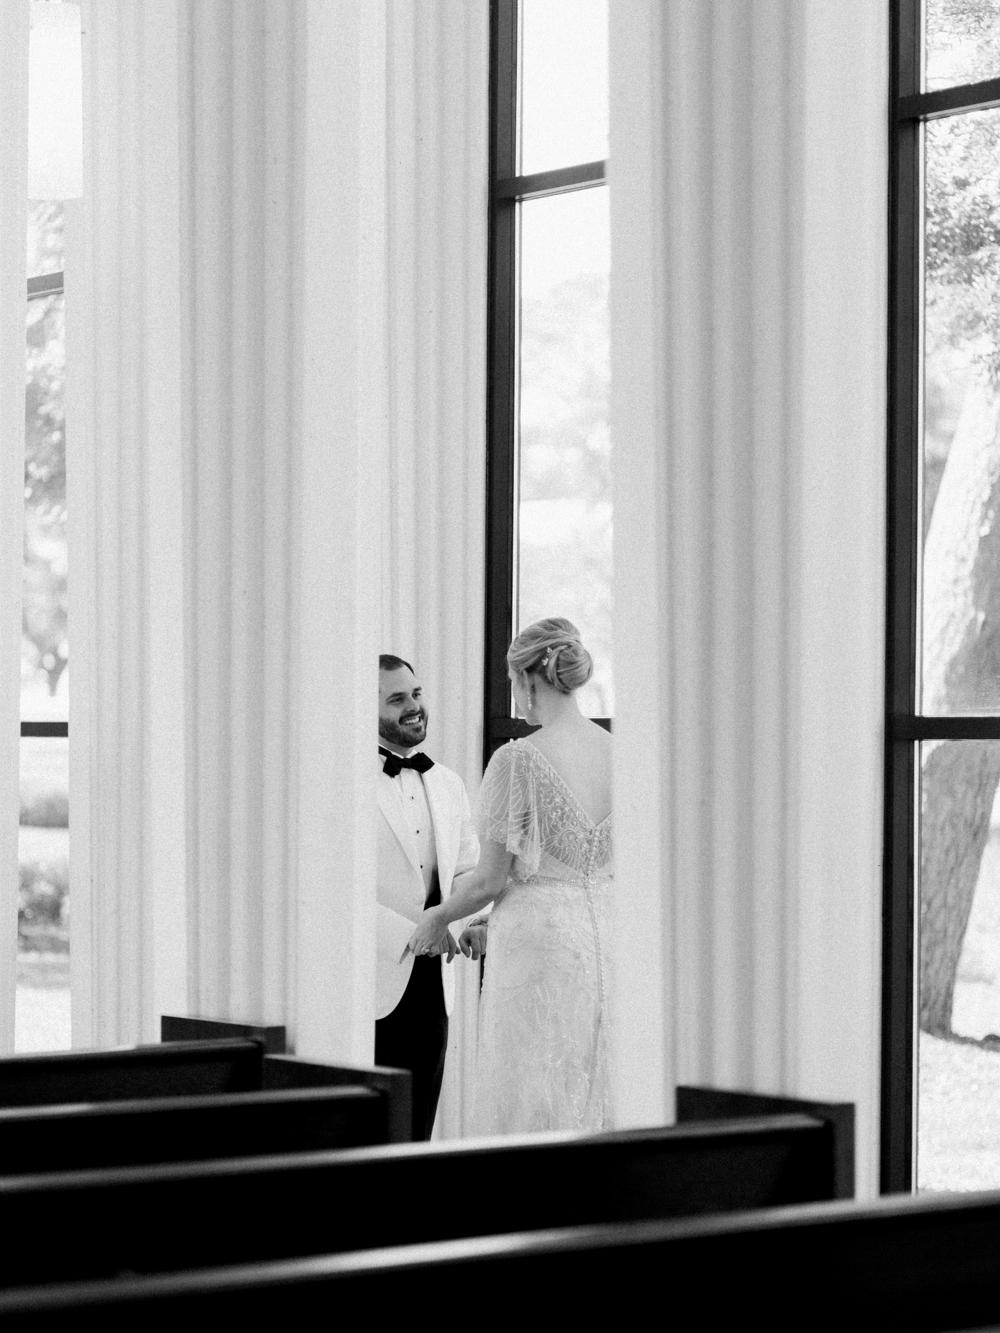 benefits of a first look_wedding photography_wedding photographer_film wedding photographer_Christine Gosch_www.christinegosch.com_Houston, Texas wedding photographer_ Houston, Texas-25.jpg